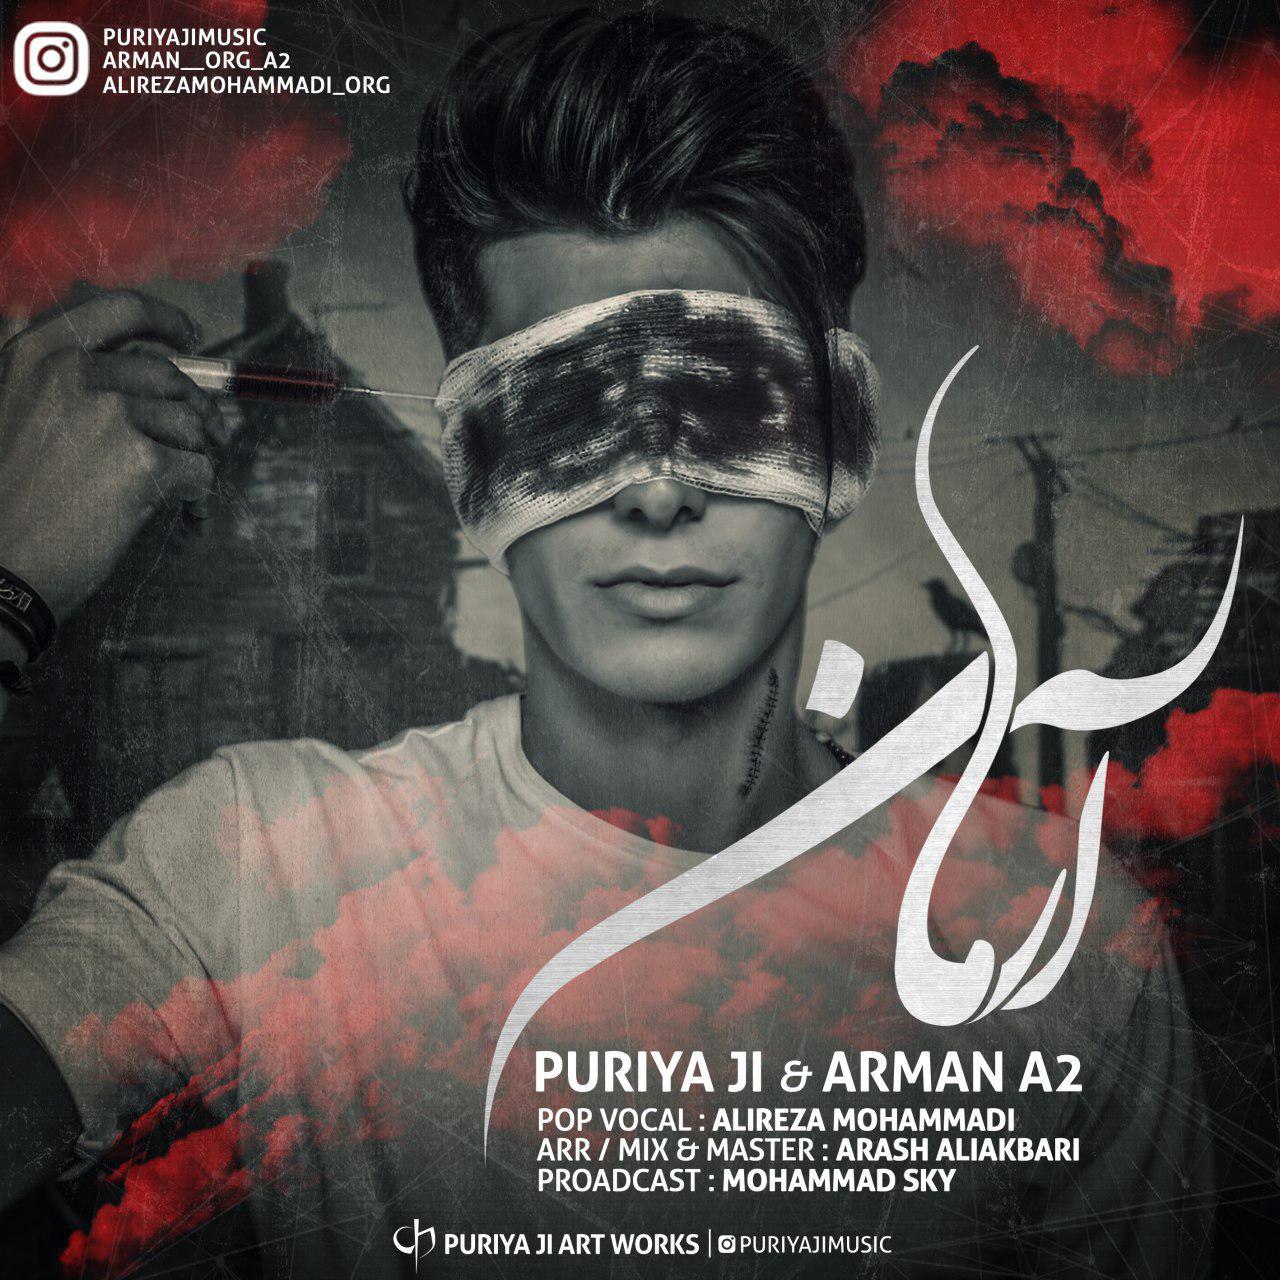 http://s9.picofile.com/file/8305247376/16Puria_Ji_Arman_A2_Arman.jpg